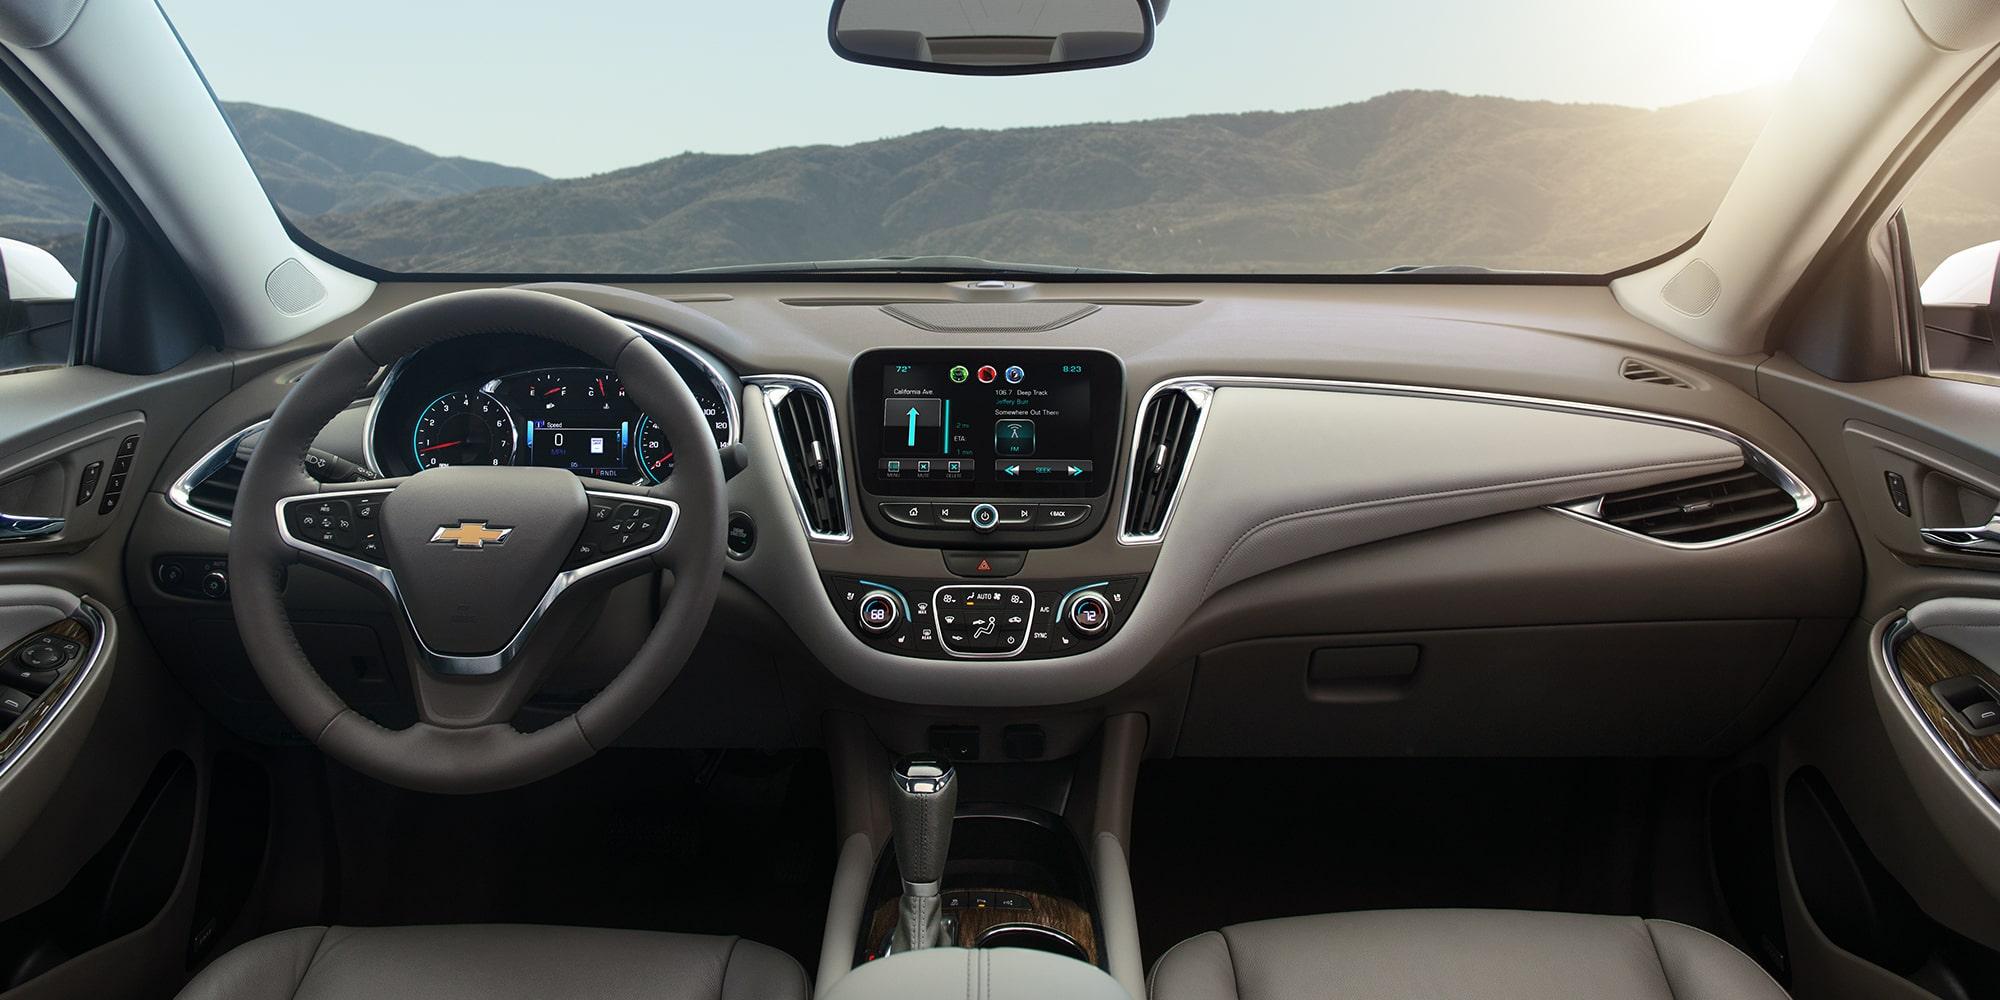 2018 Chevrolet Malibu Mid Size Car Interior Photo: Front Seats